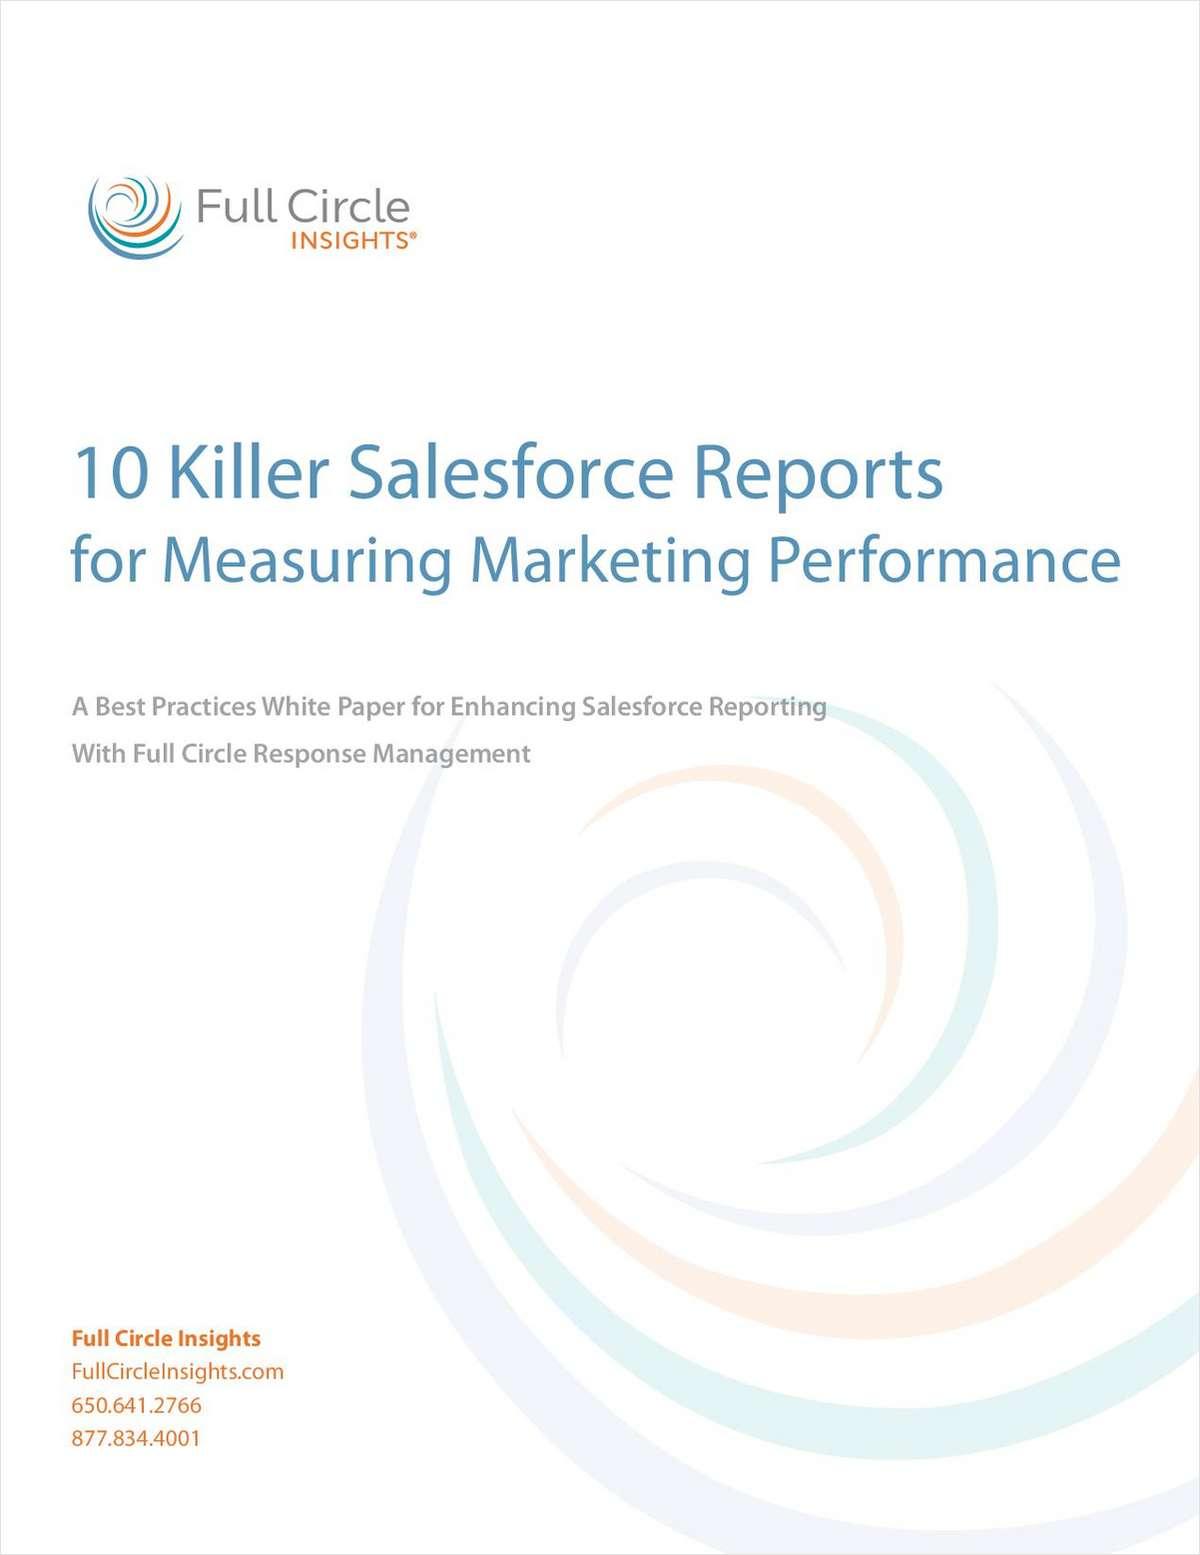 10 Killer Salesforce Reports for Measuring Marketing Performance